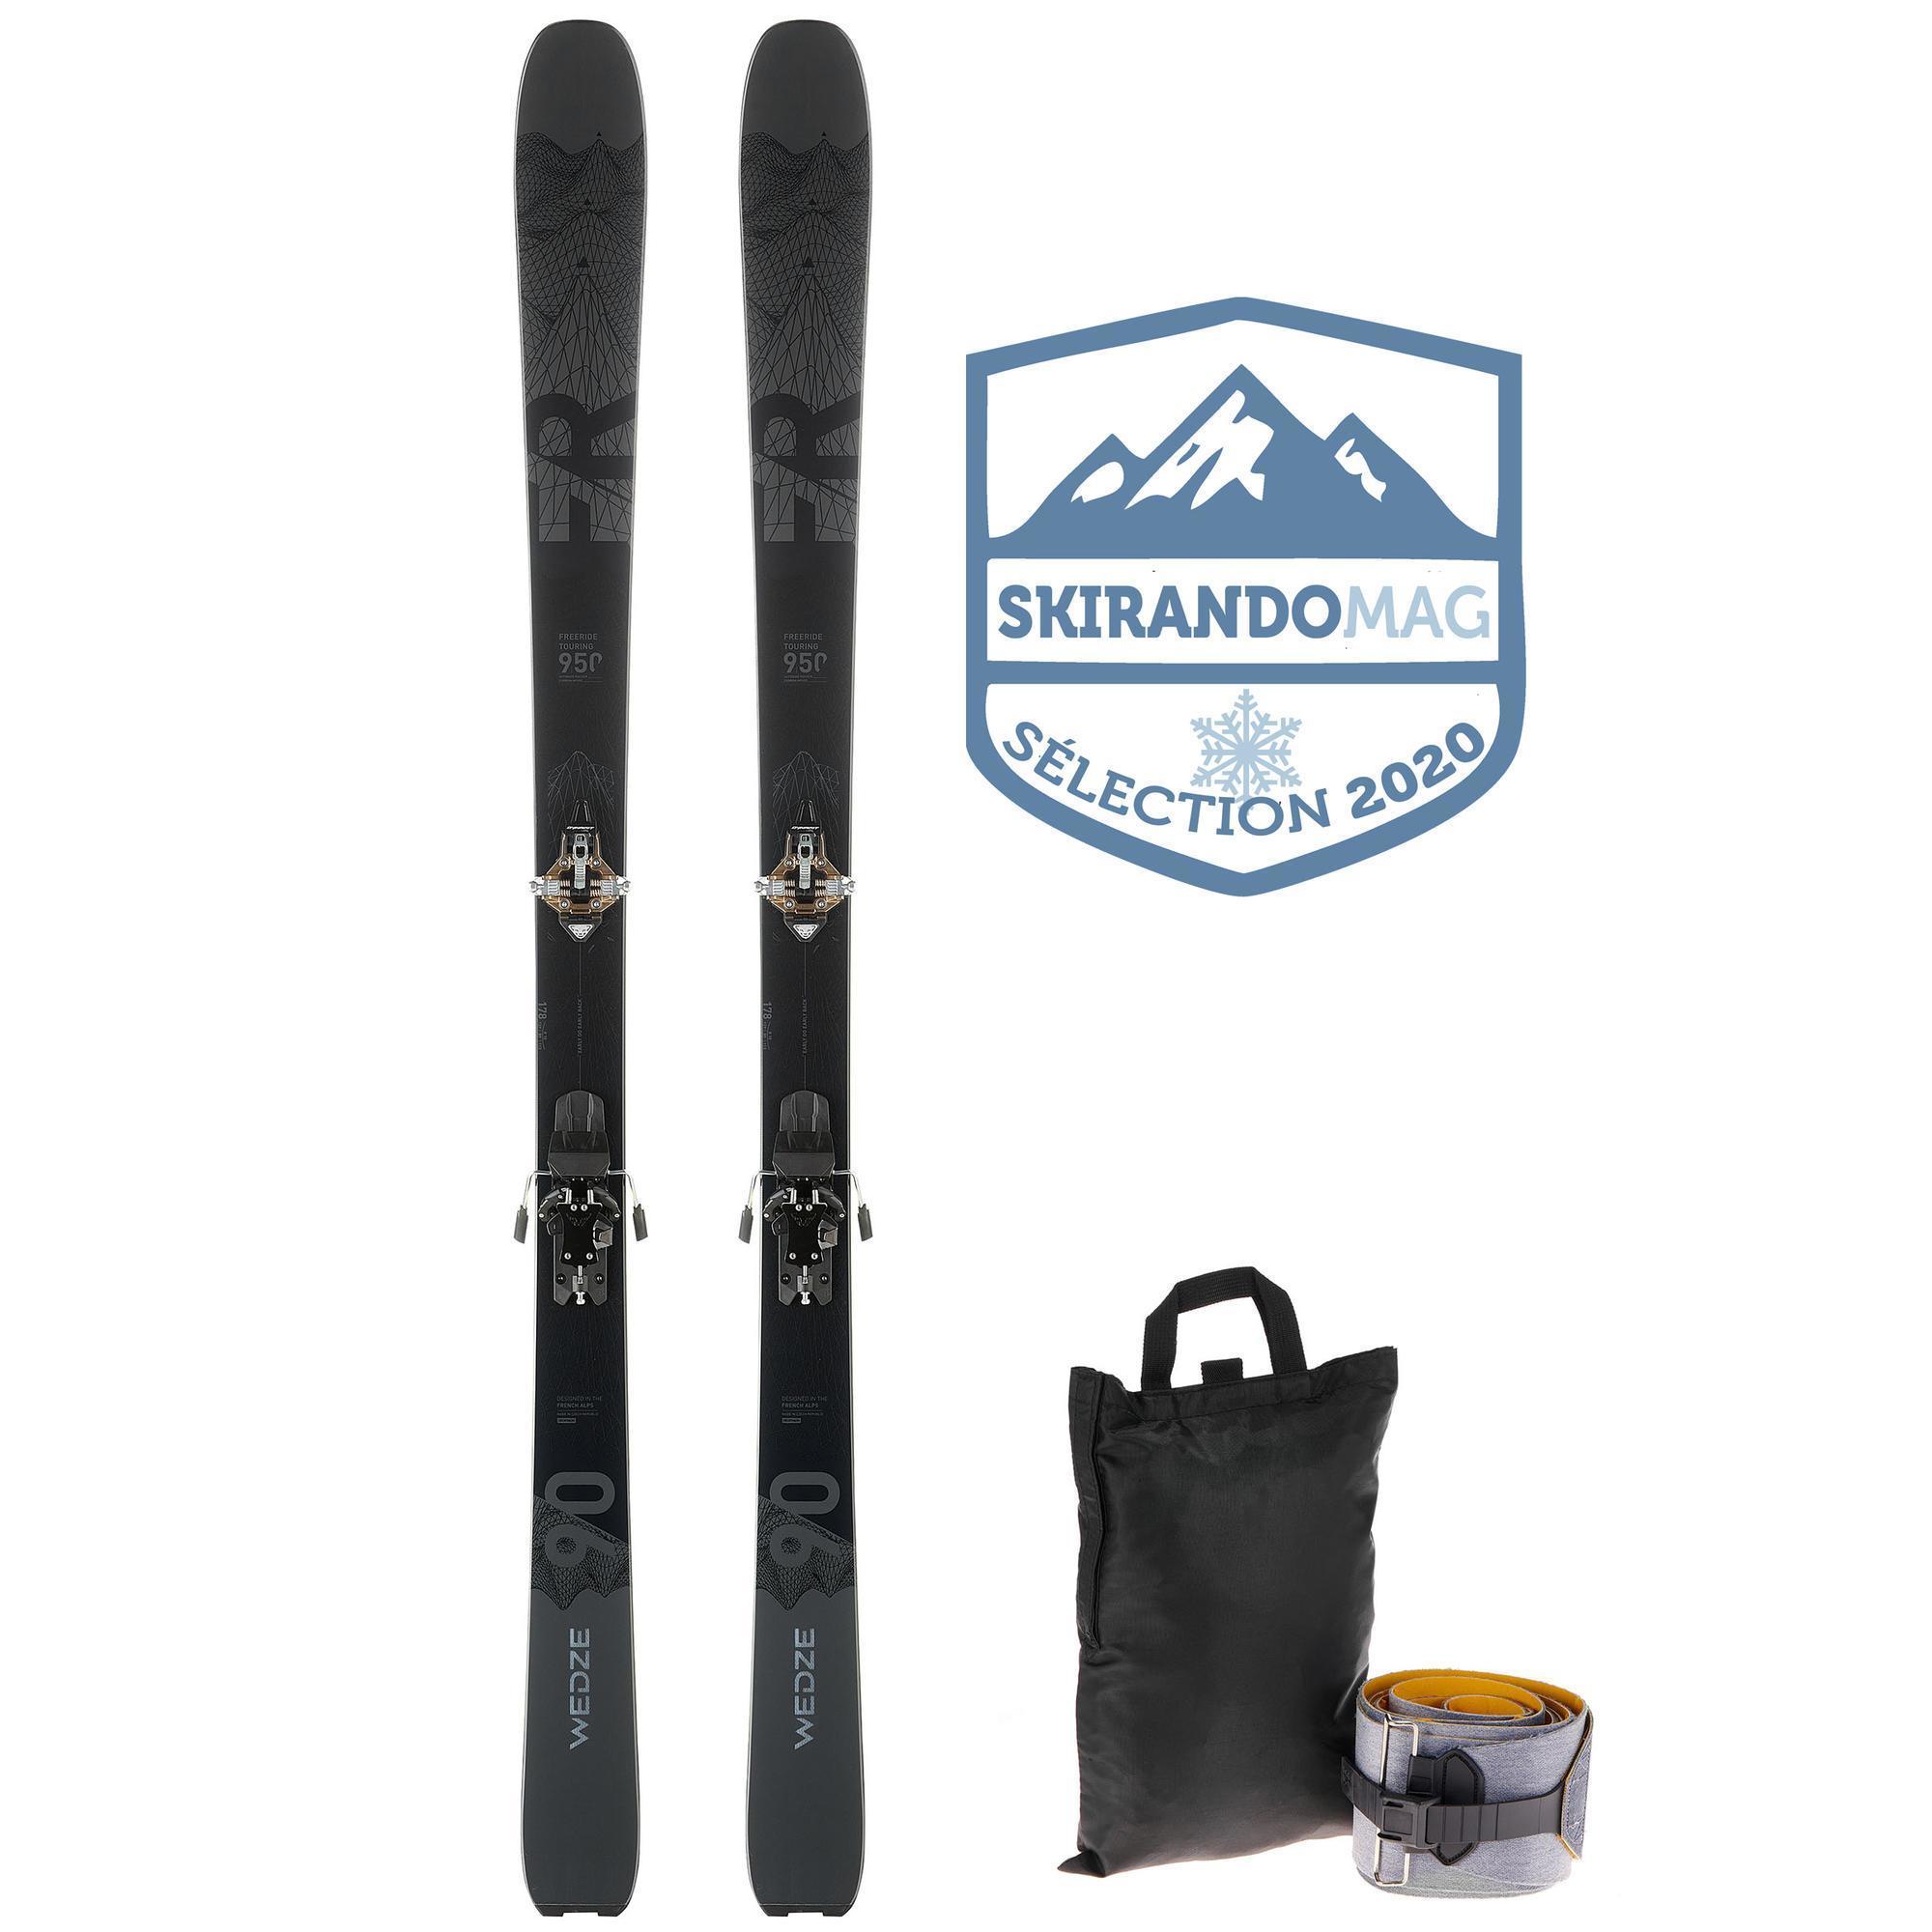 1798daf2d69 Ski's kopen ← Decathlon.nl